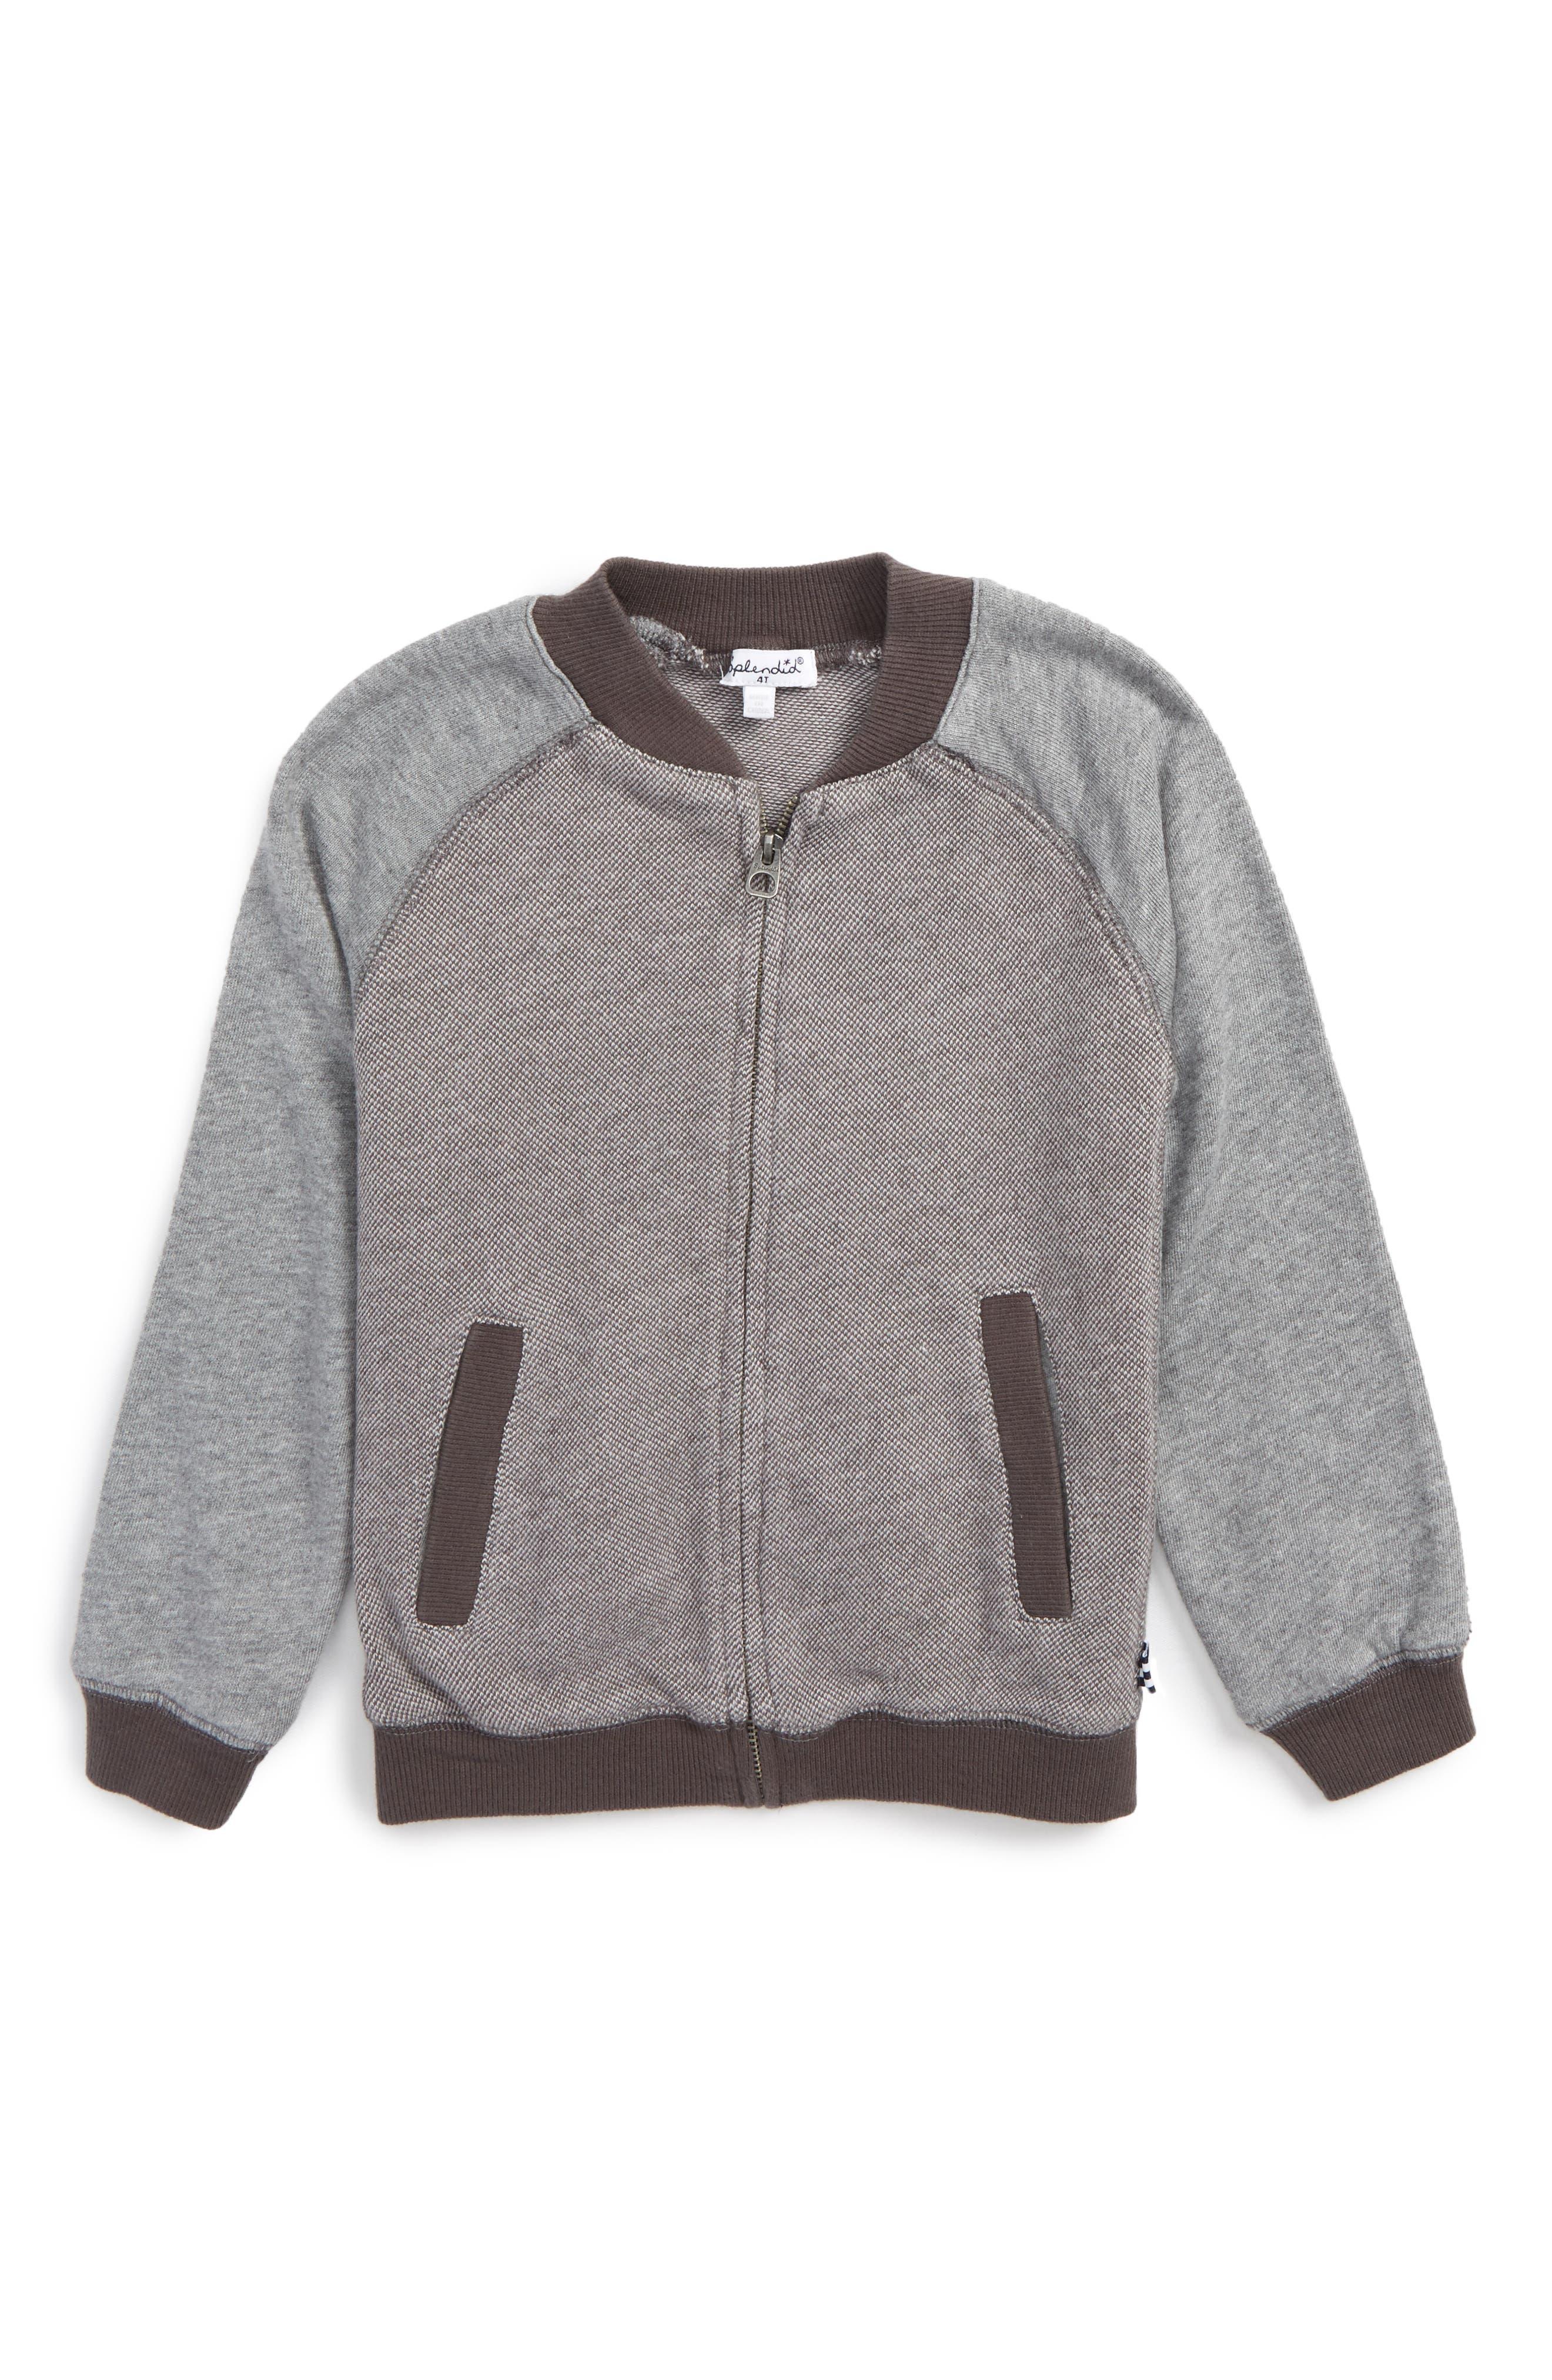 Splendid Birdseye Knit Jacket (Toddler Boys & Little Boys)